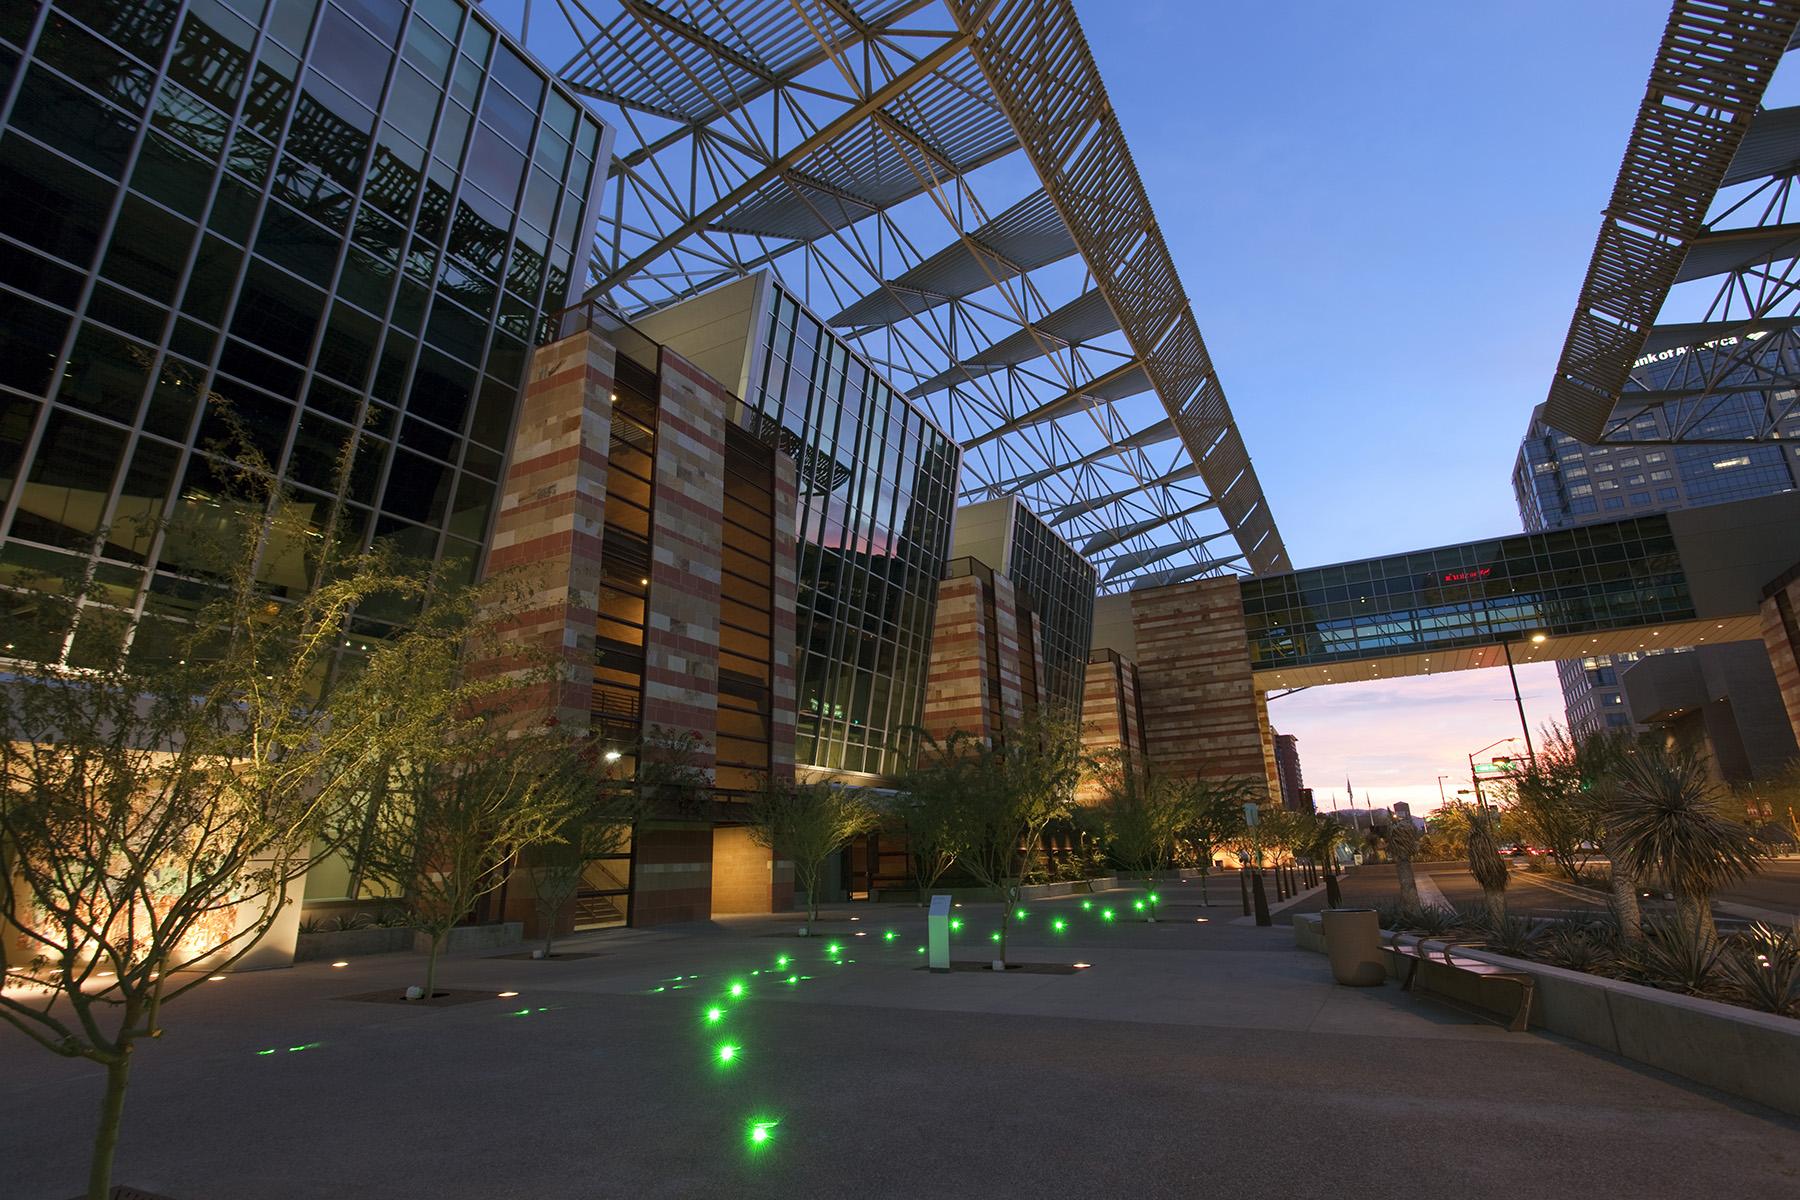 Take A Walking Tour With The Downtown Phoenix Ambassadors